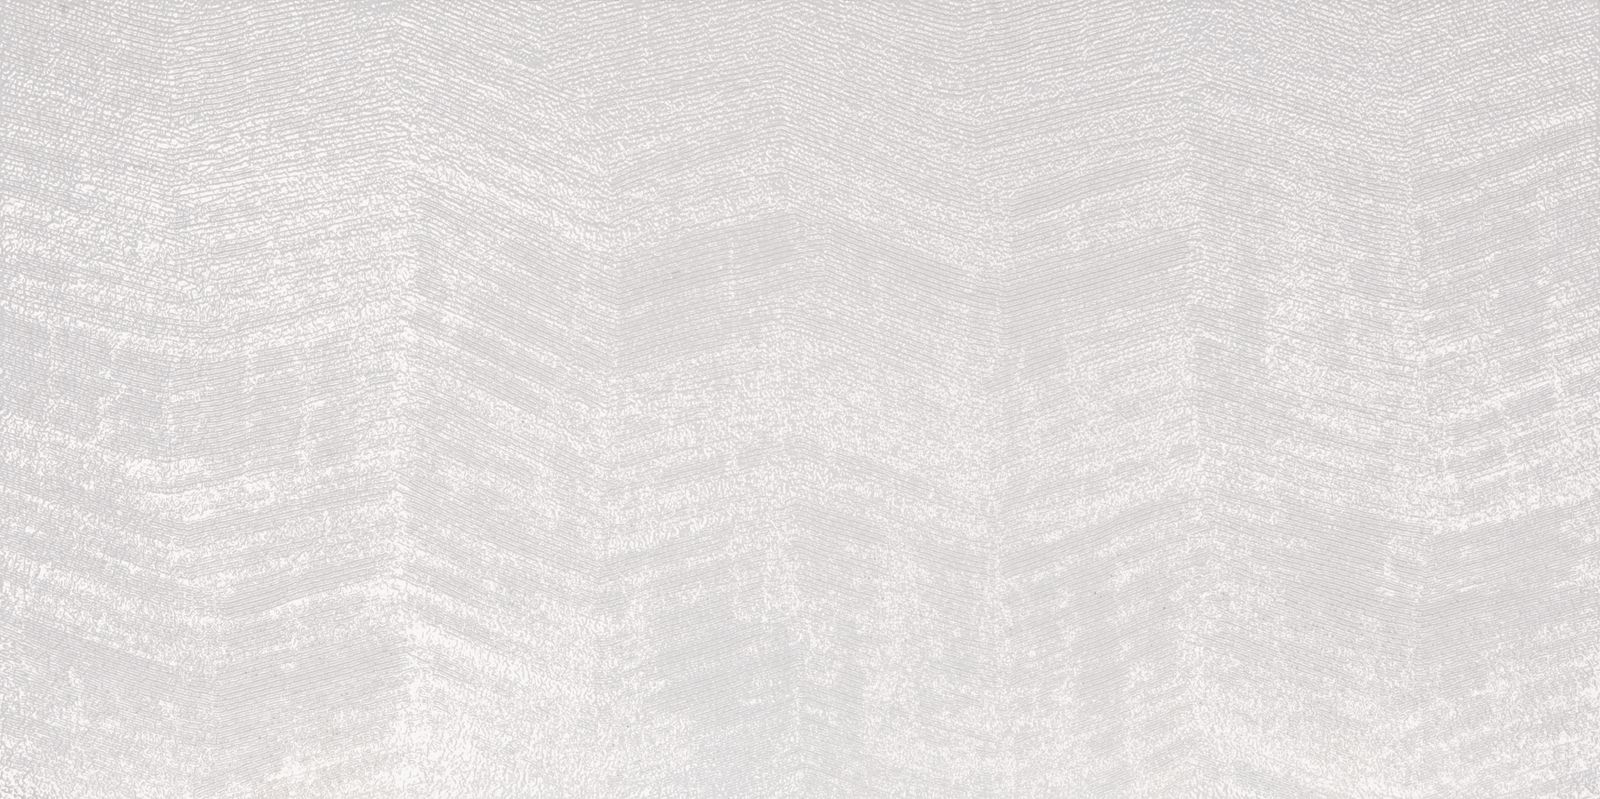 Плитка PEARL Pearl (znxsw1r) изображение 2